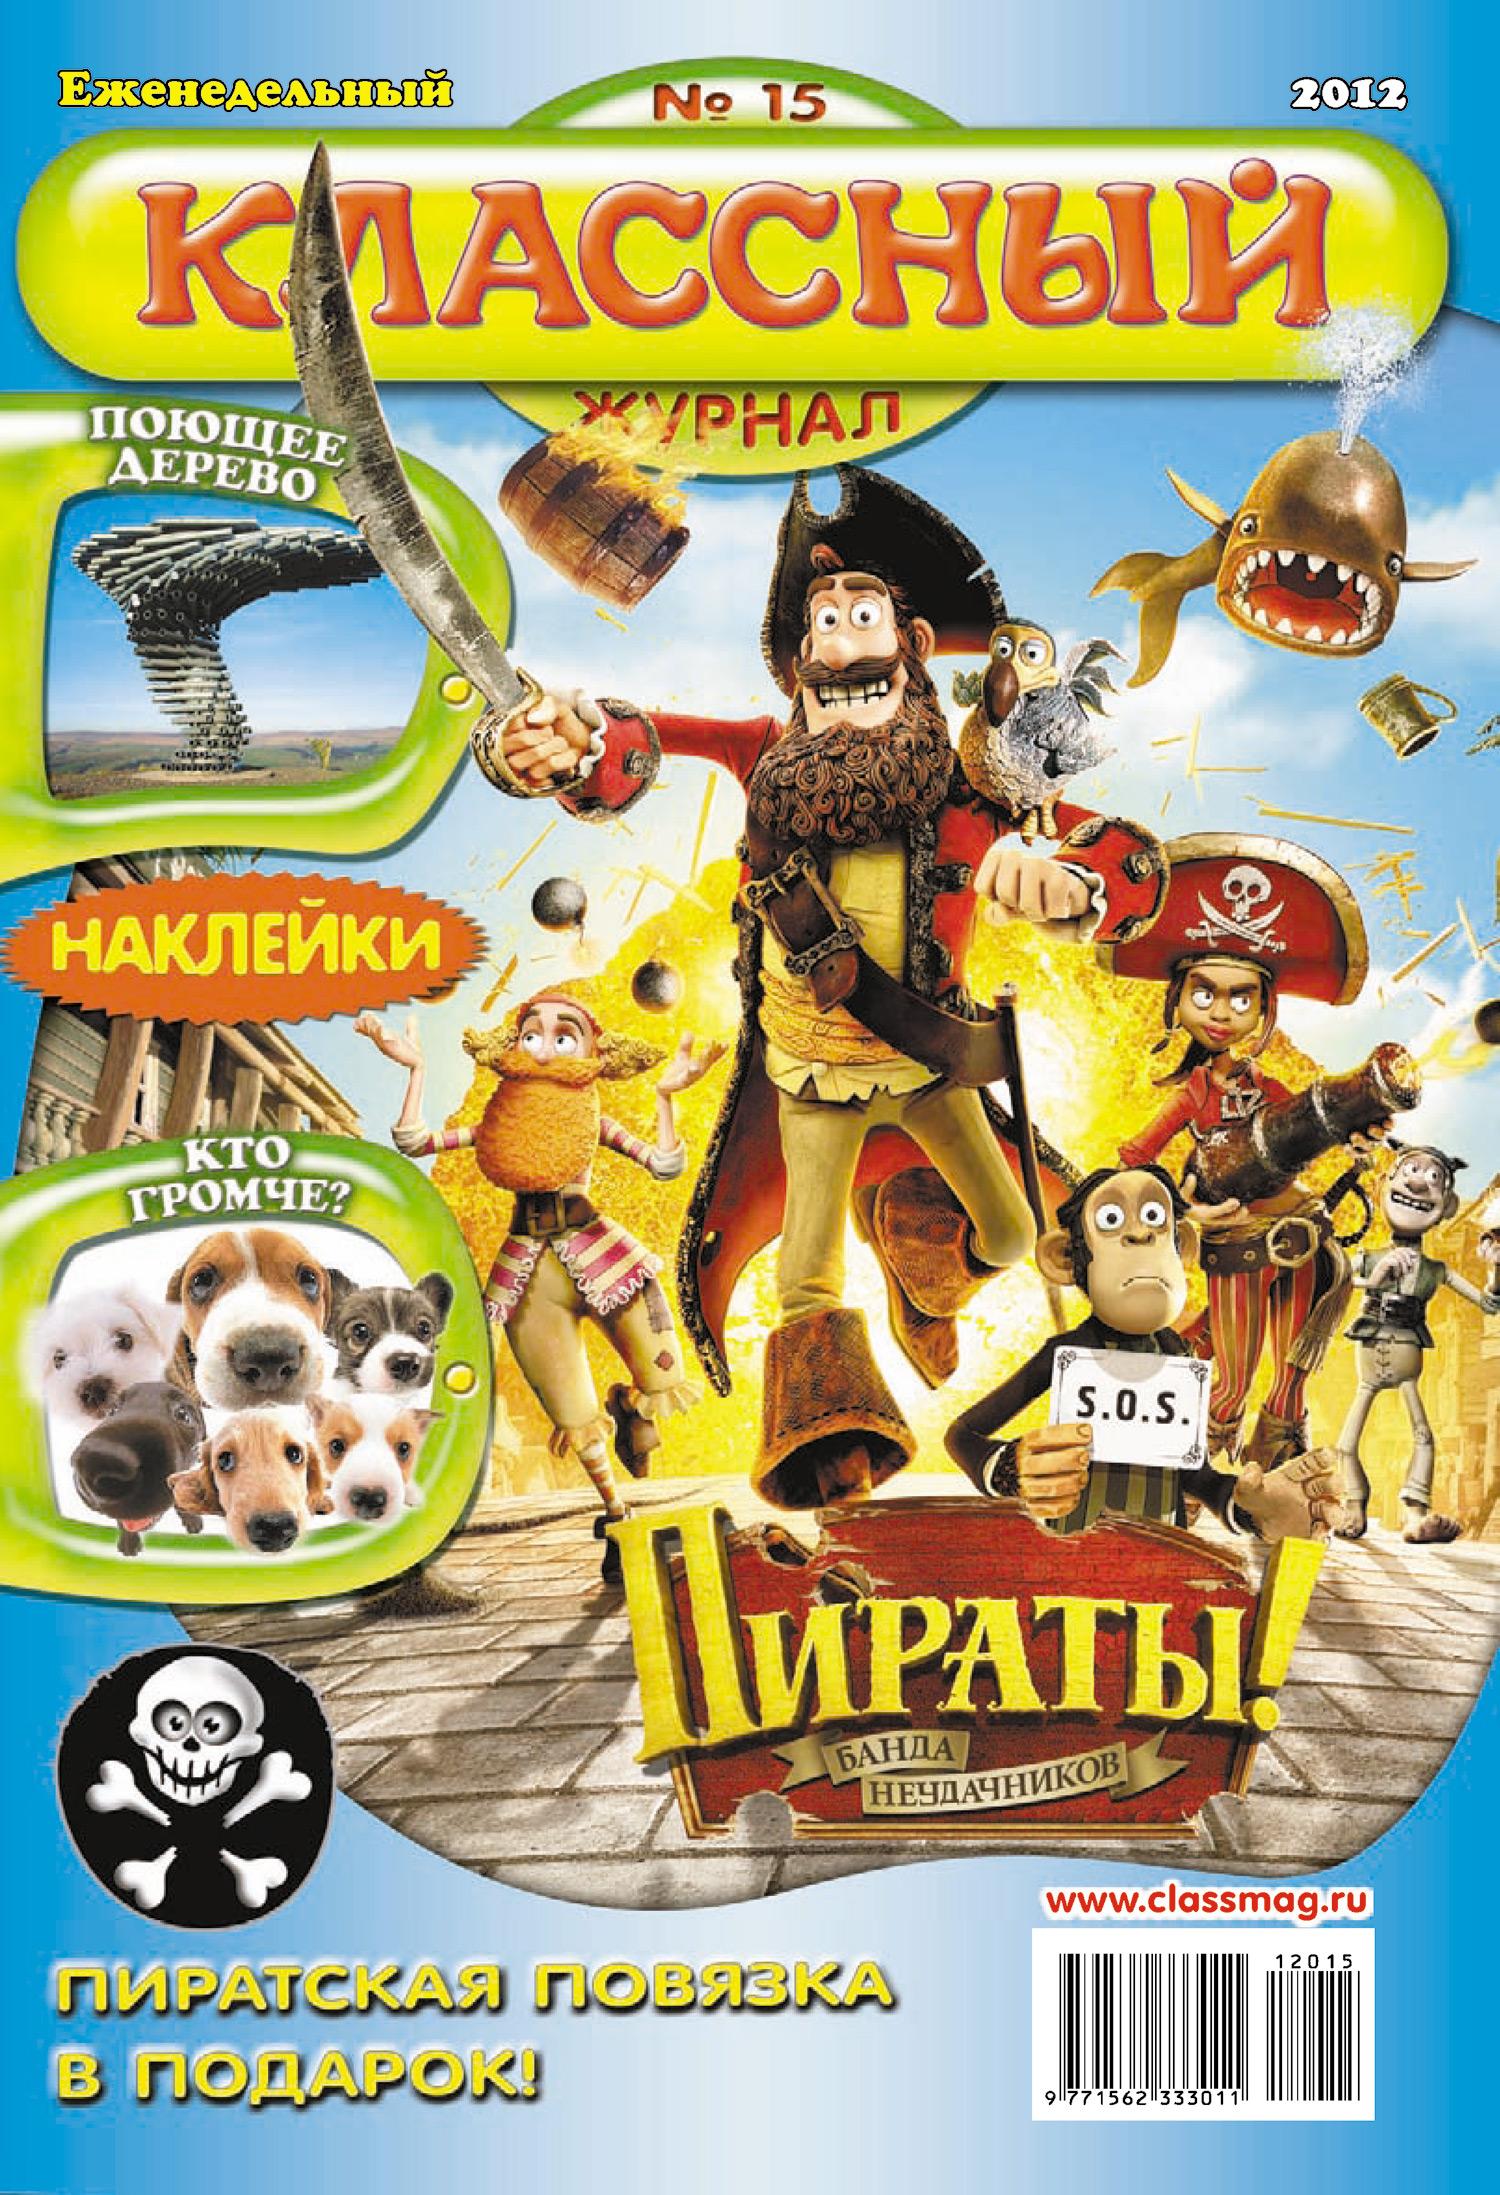 Классный журнал №15/2012